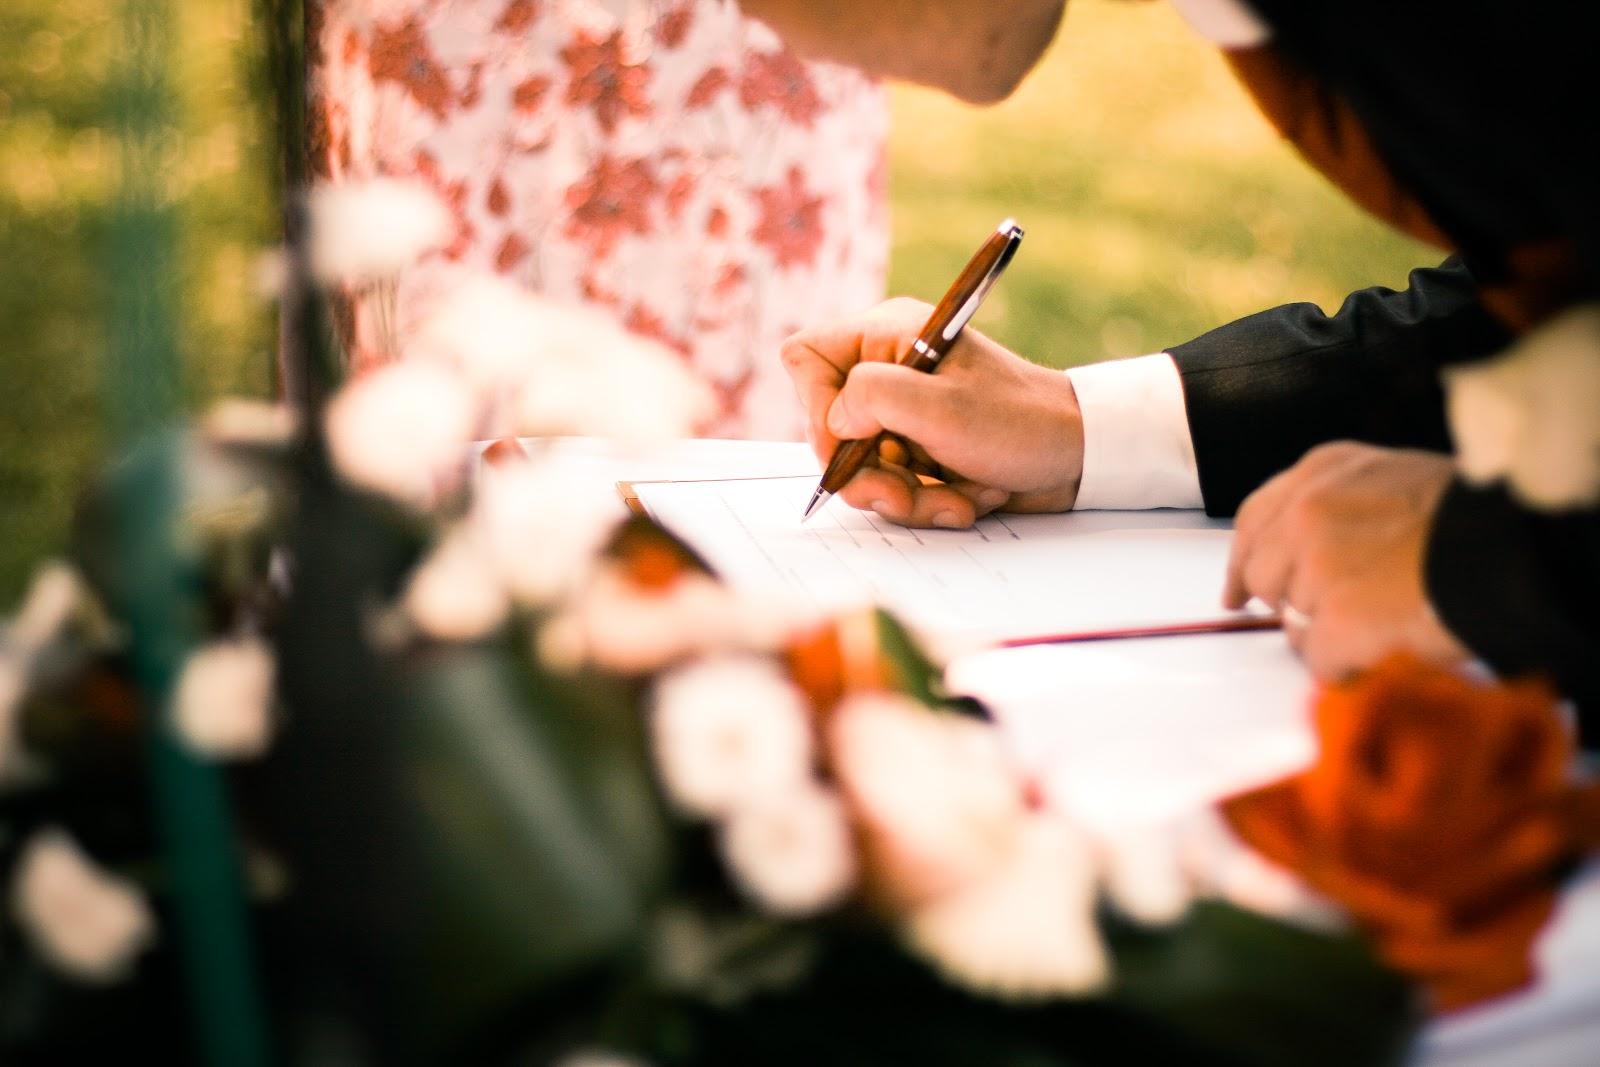 grooms-wedding-sign-picjumbo-com.jpg